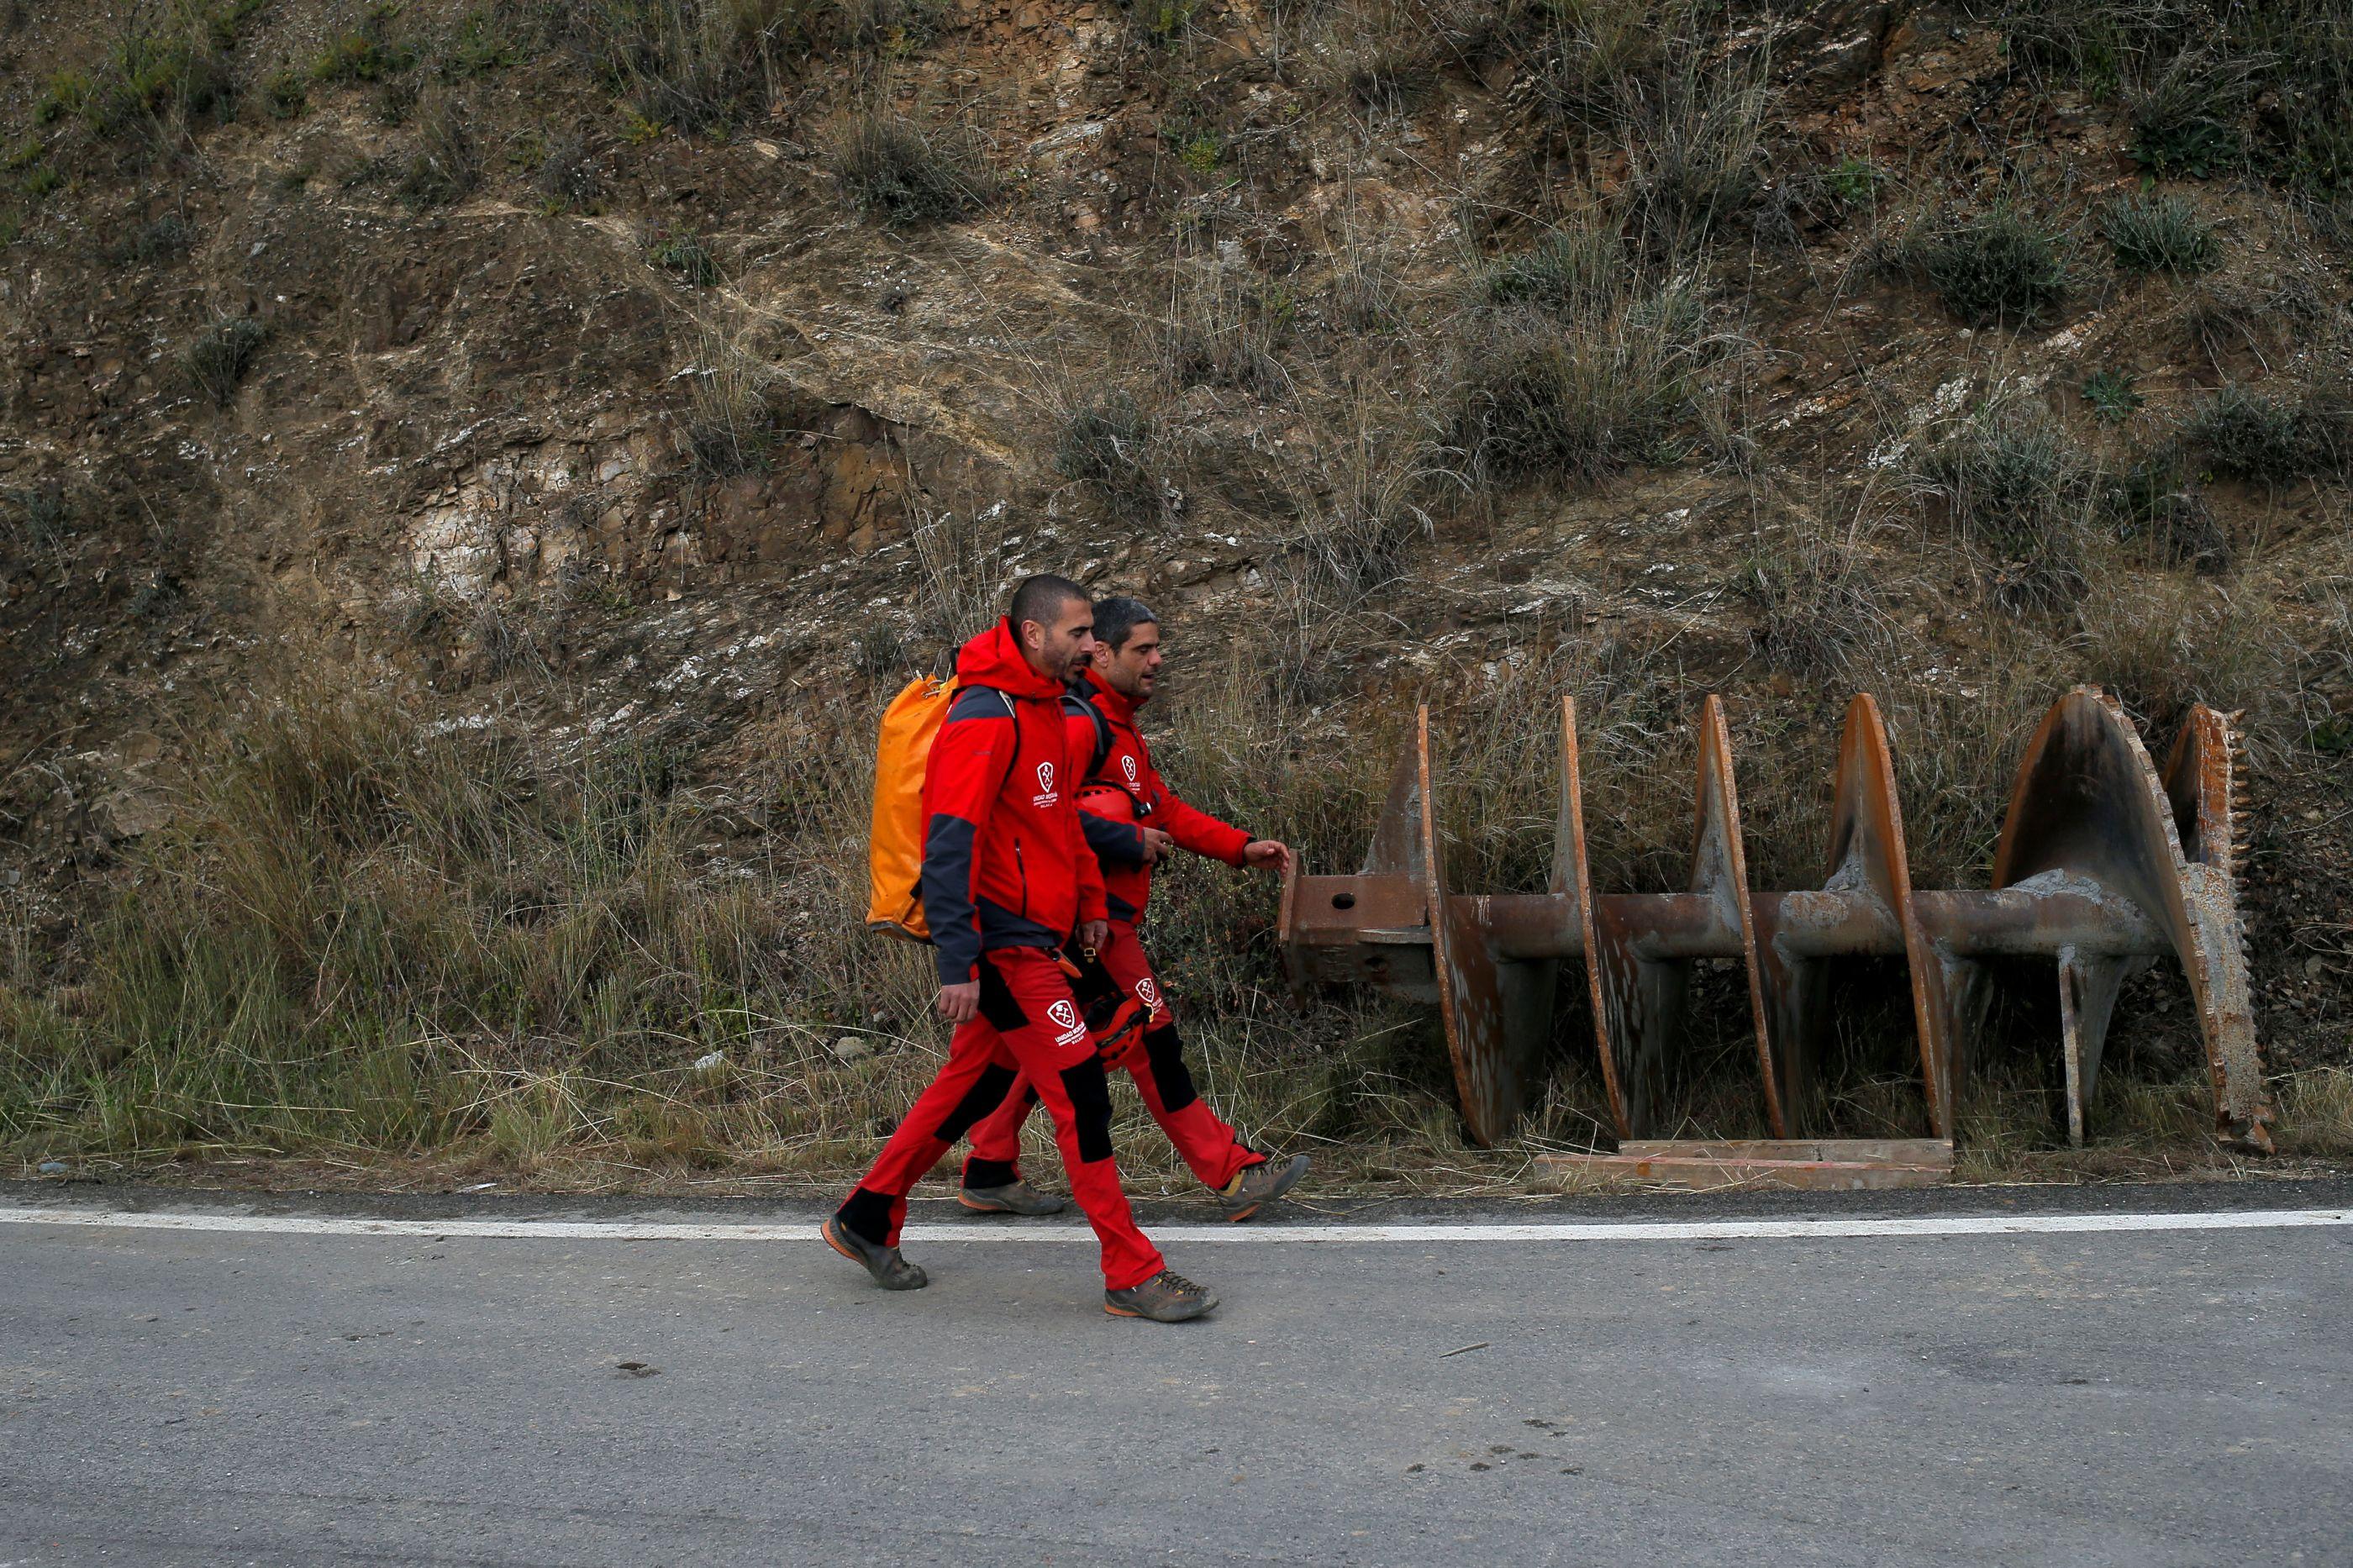 As últimas imagens que chegam do resgate ao pequeno Julen